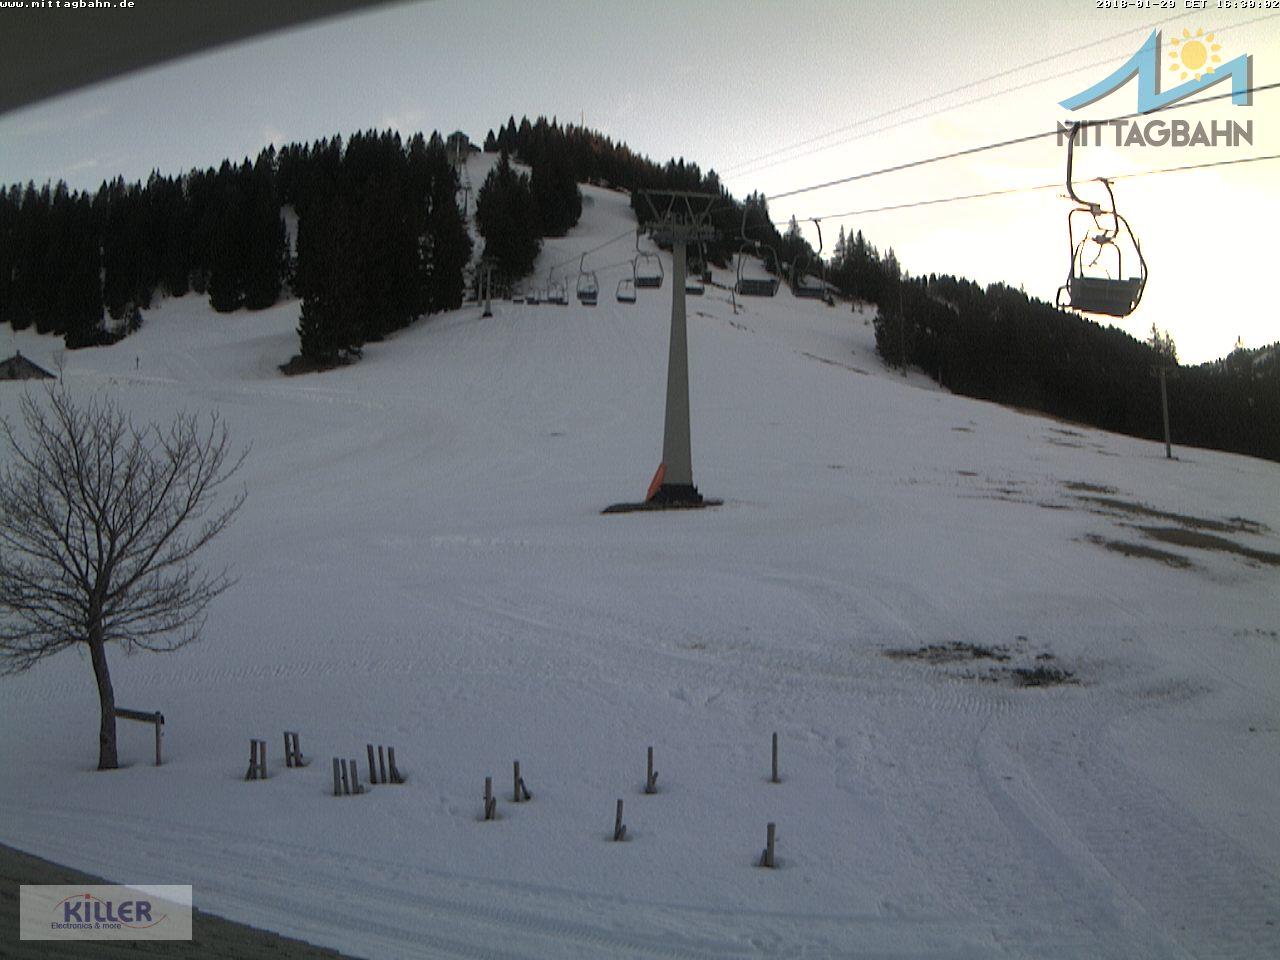 Webcam Skigebied Immenstadt - Mittag cam 5 - Allgäuer Alpen